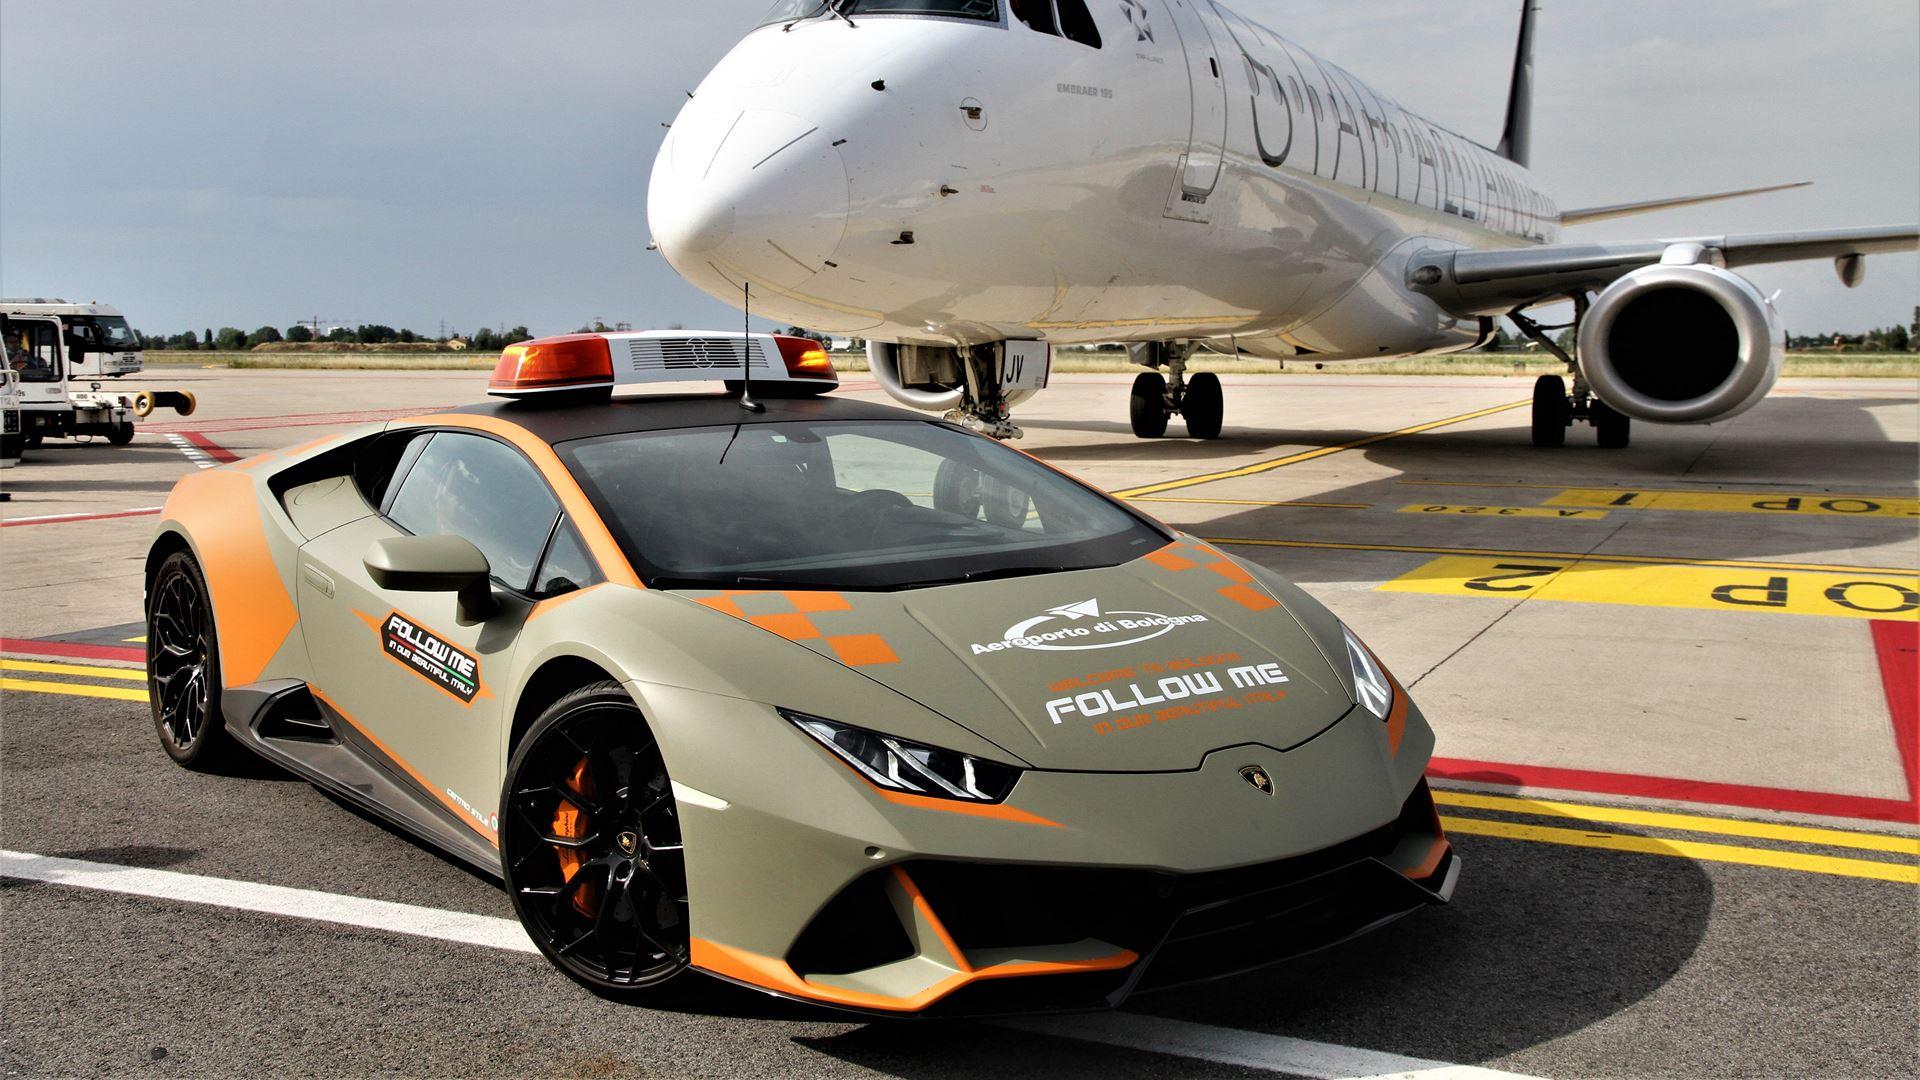 A new Lamborghini Huracán EVO follow-me car for Bologna Airport - Image 8